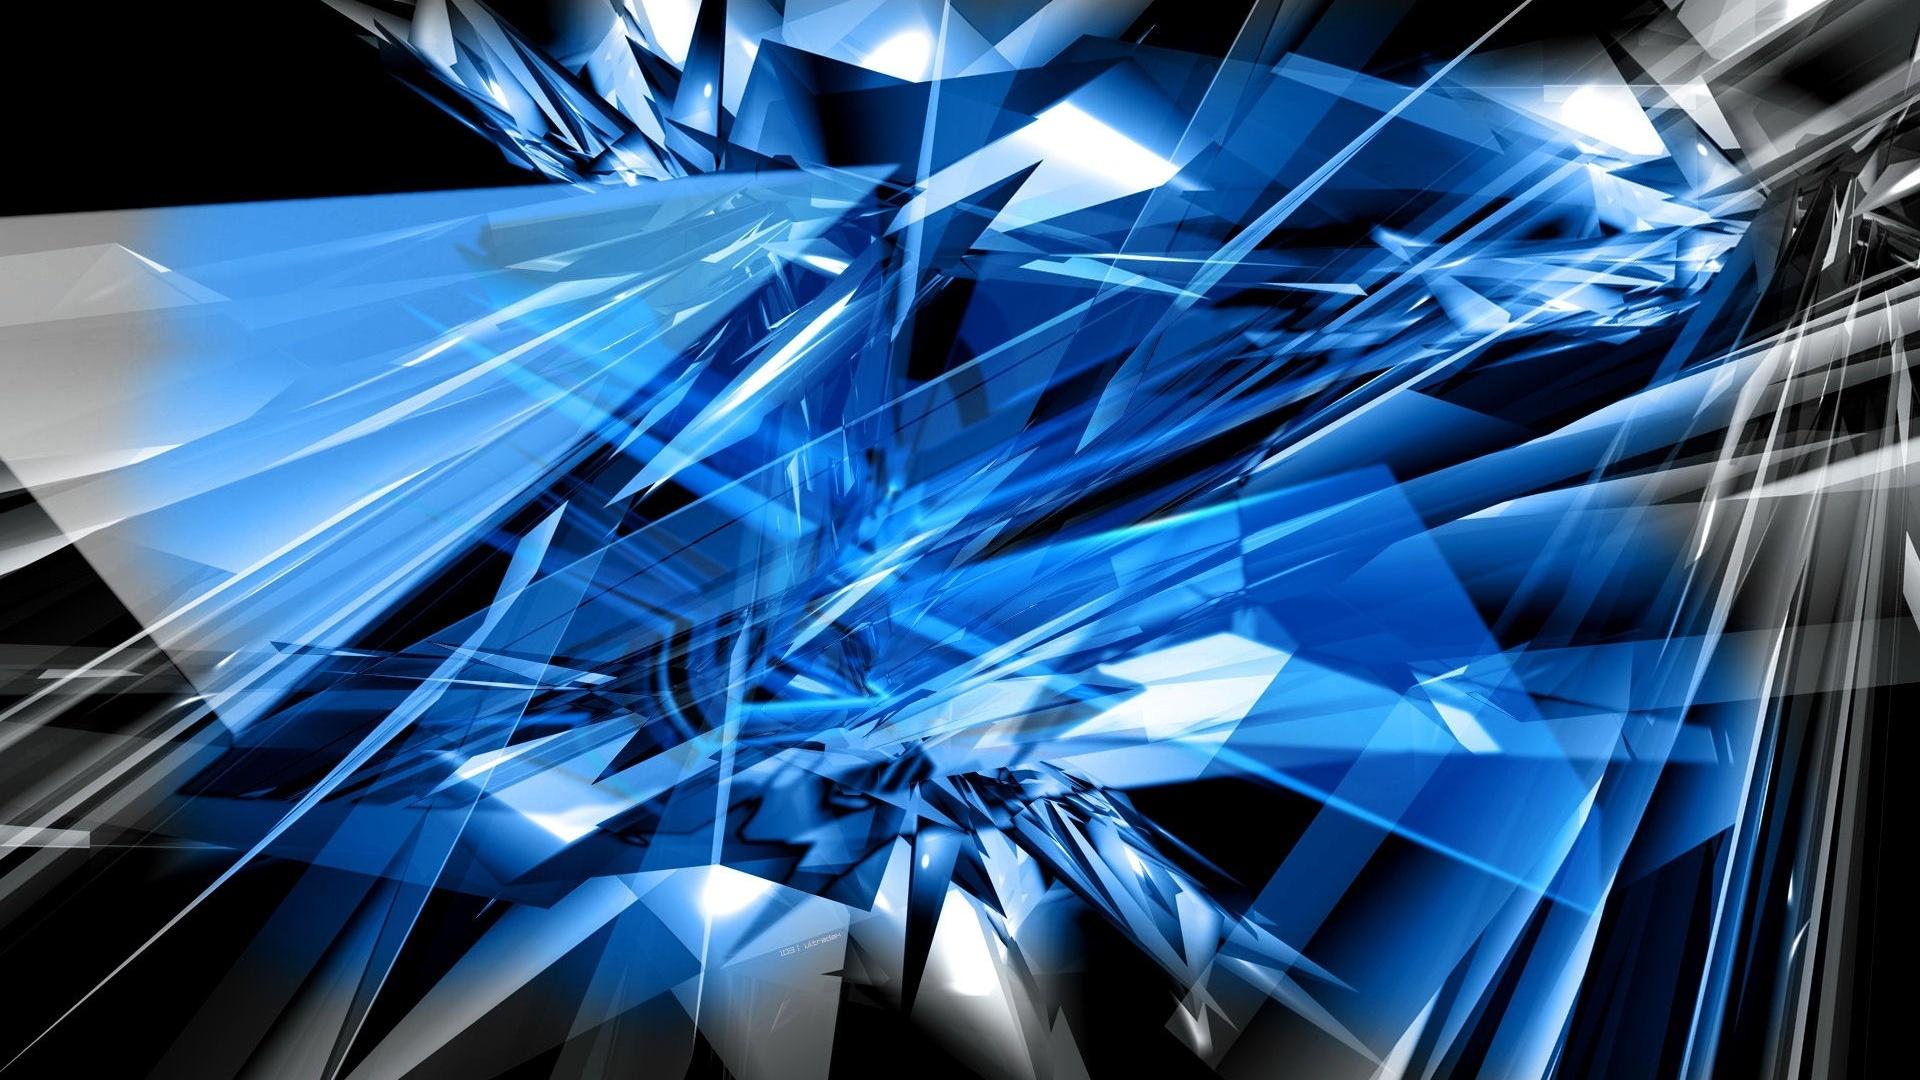 10 Top Black And Blue Shards Wallpaper Full Hd 1080p For: 超酷动漫图片大全-异形图片大全